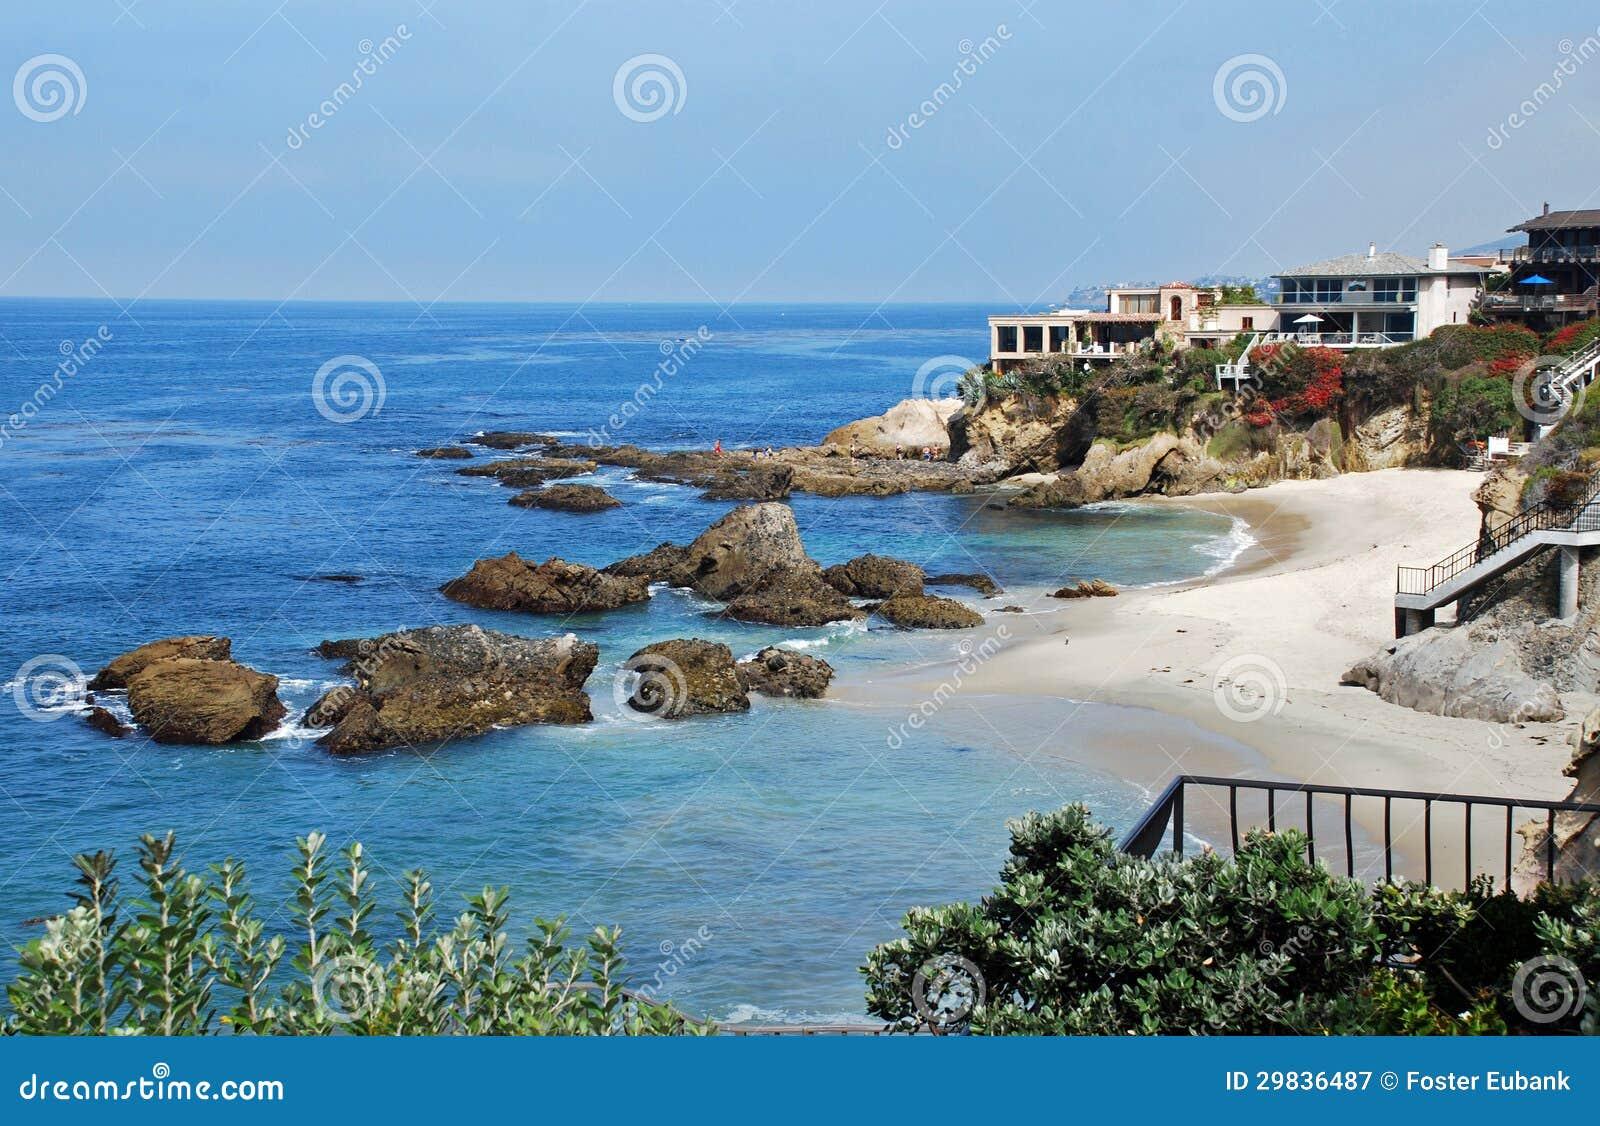 Holz-Bucht, Laguna Beach, Kalifornien. Lizenzfreie ...  Holz-Bucht, Lag...